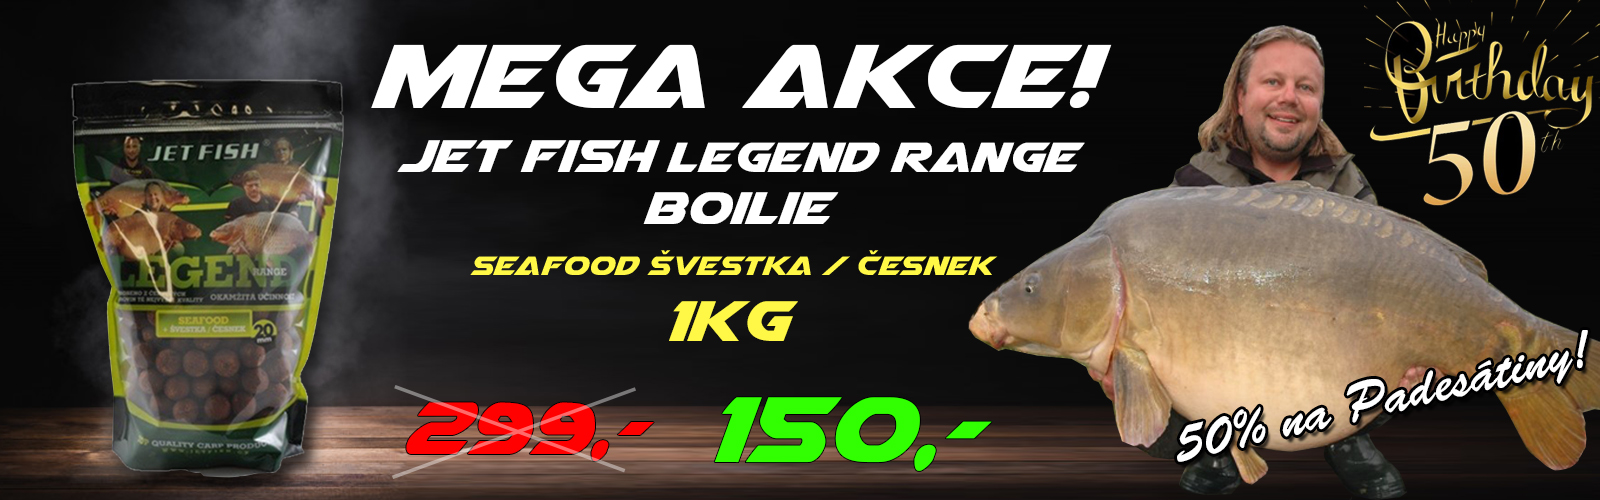 Mega Akce Jetfish 50%!